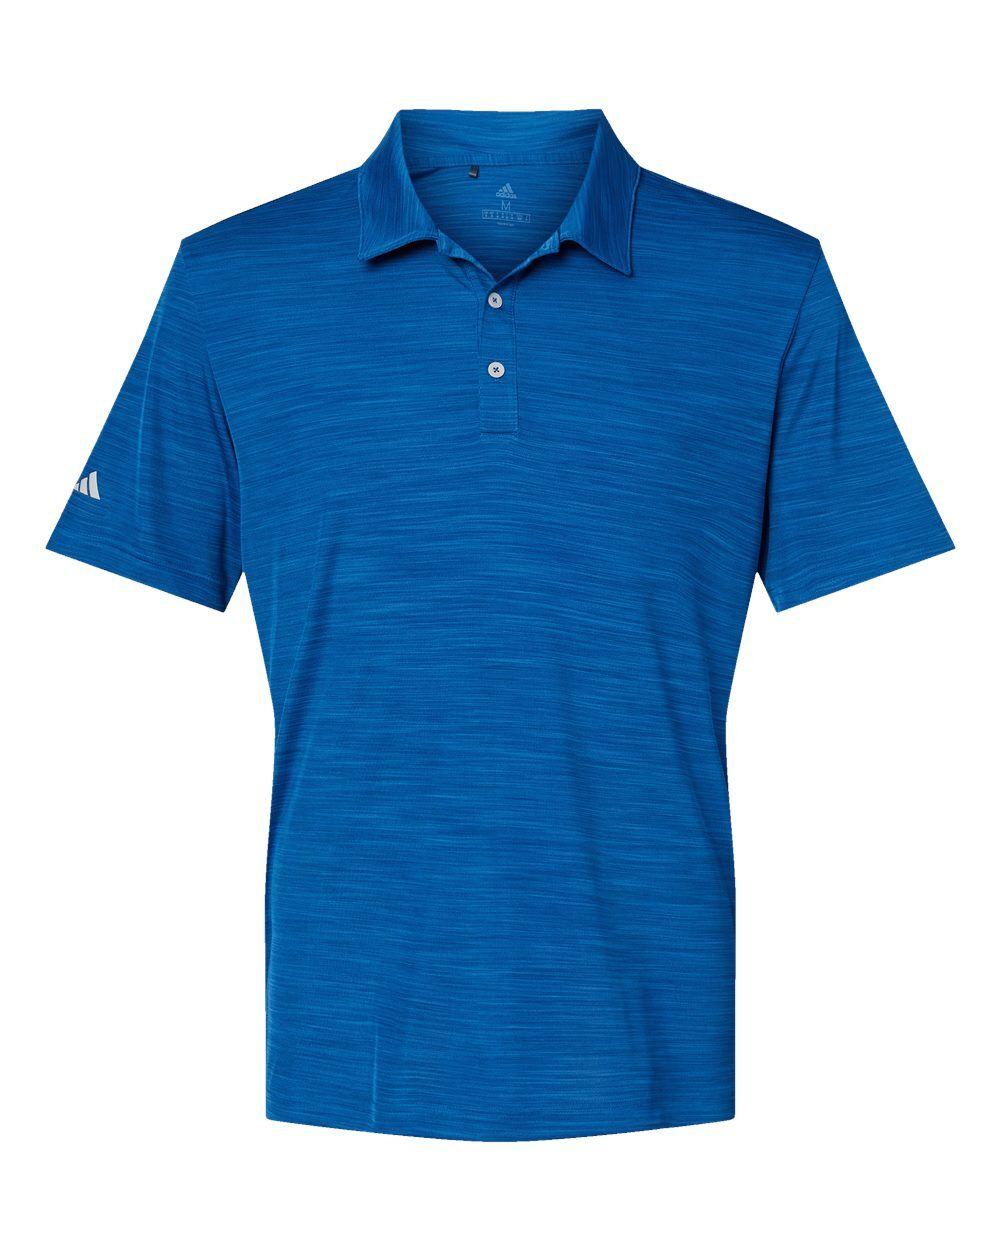 Adidas - Mlange Sport Shirt - A402 - Collegiate Royal Melange - Large